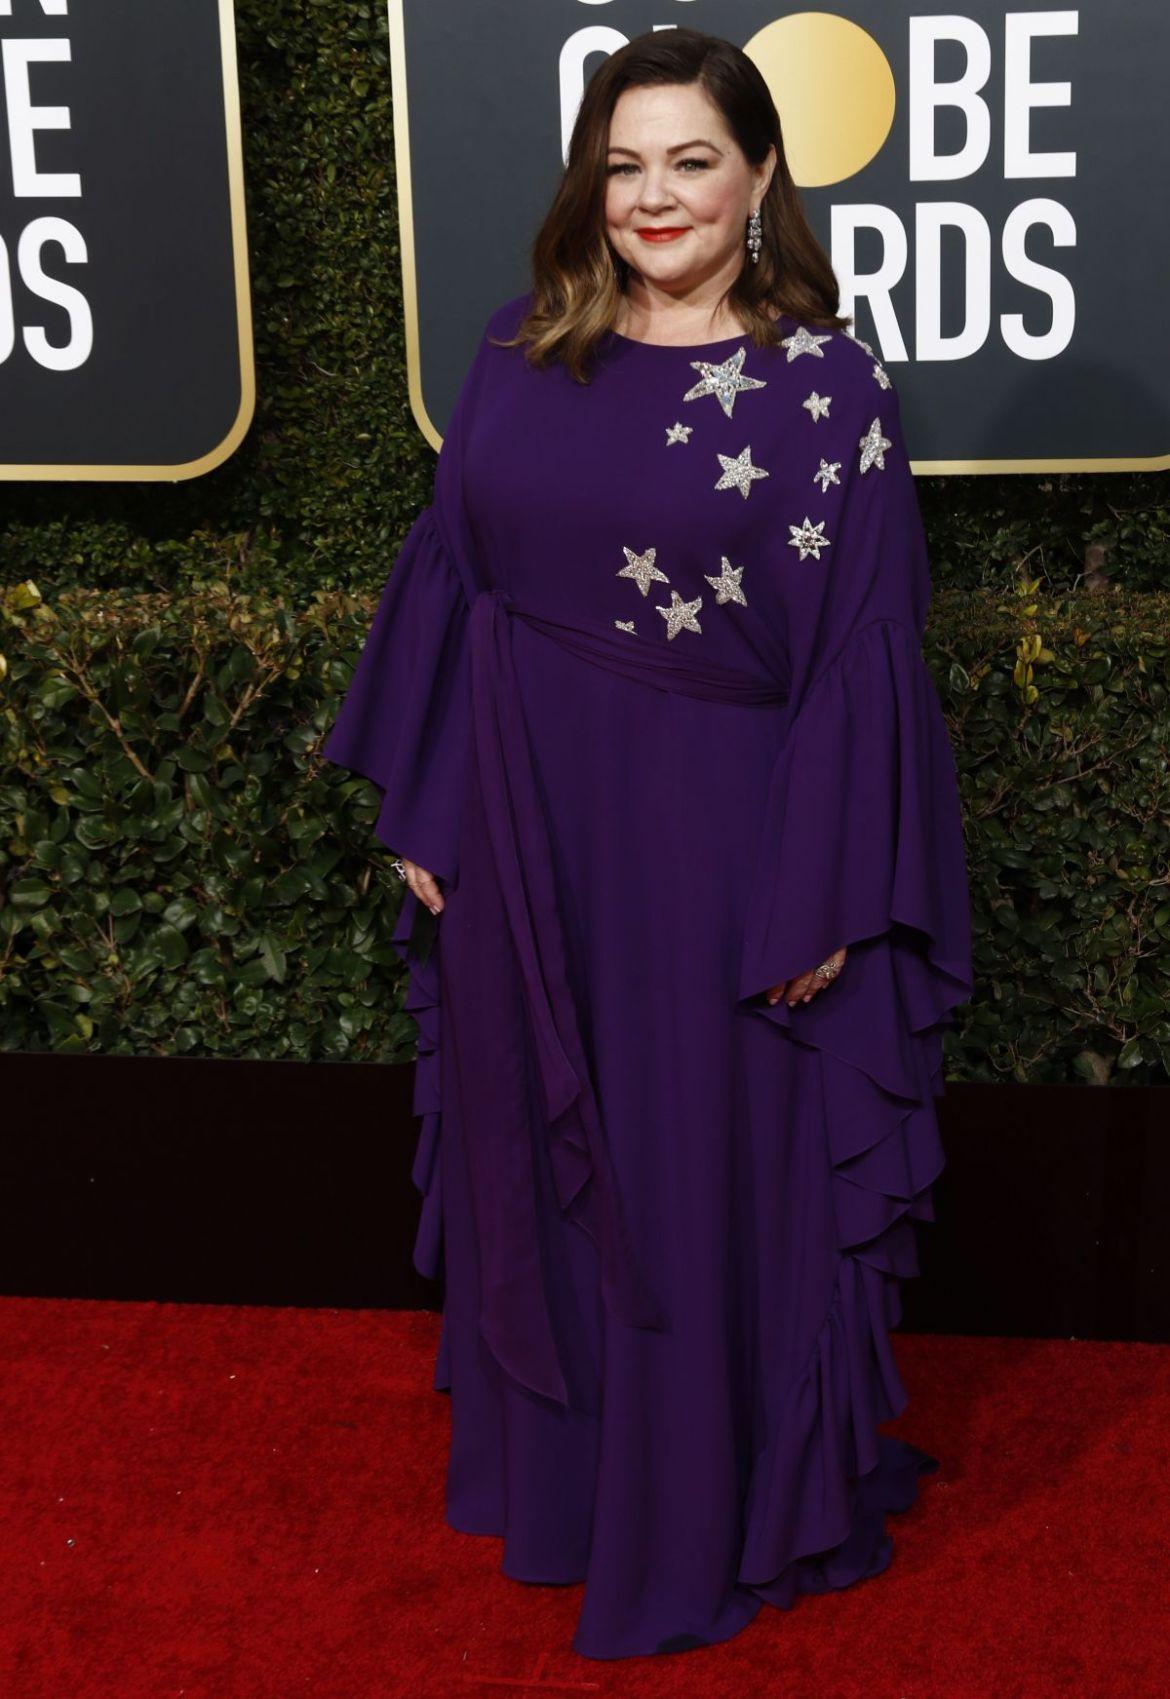 MELISSA MCARTHY at 2019 Golden Globe Awards in Beverly Hills 01/06/2019